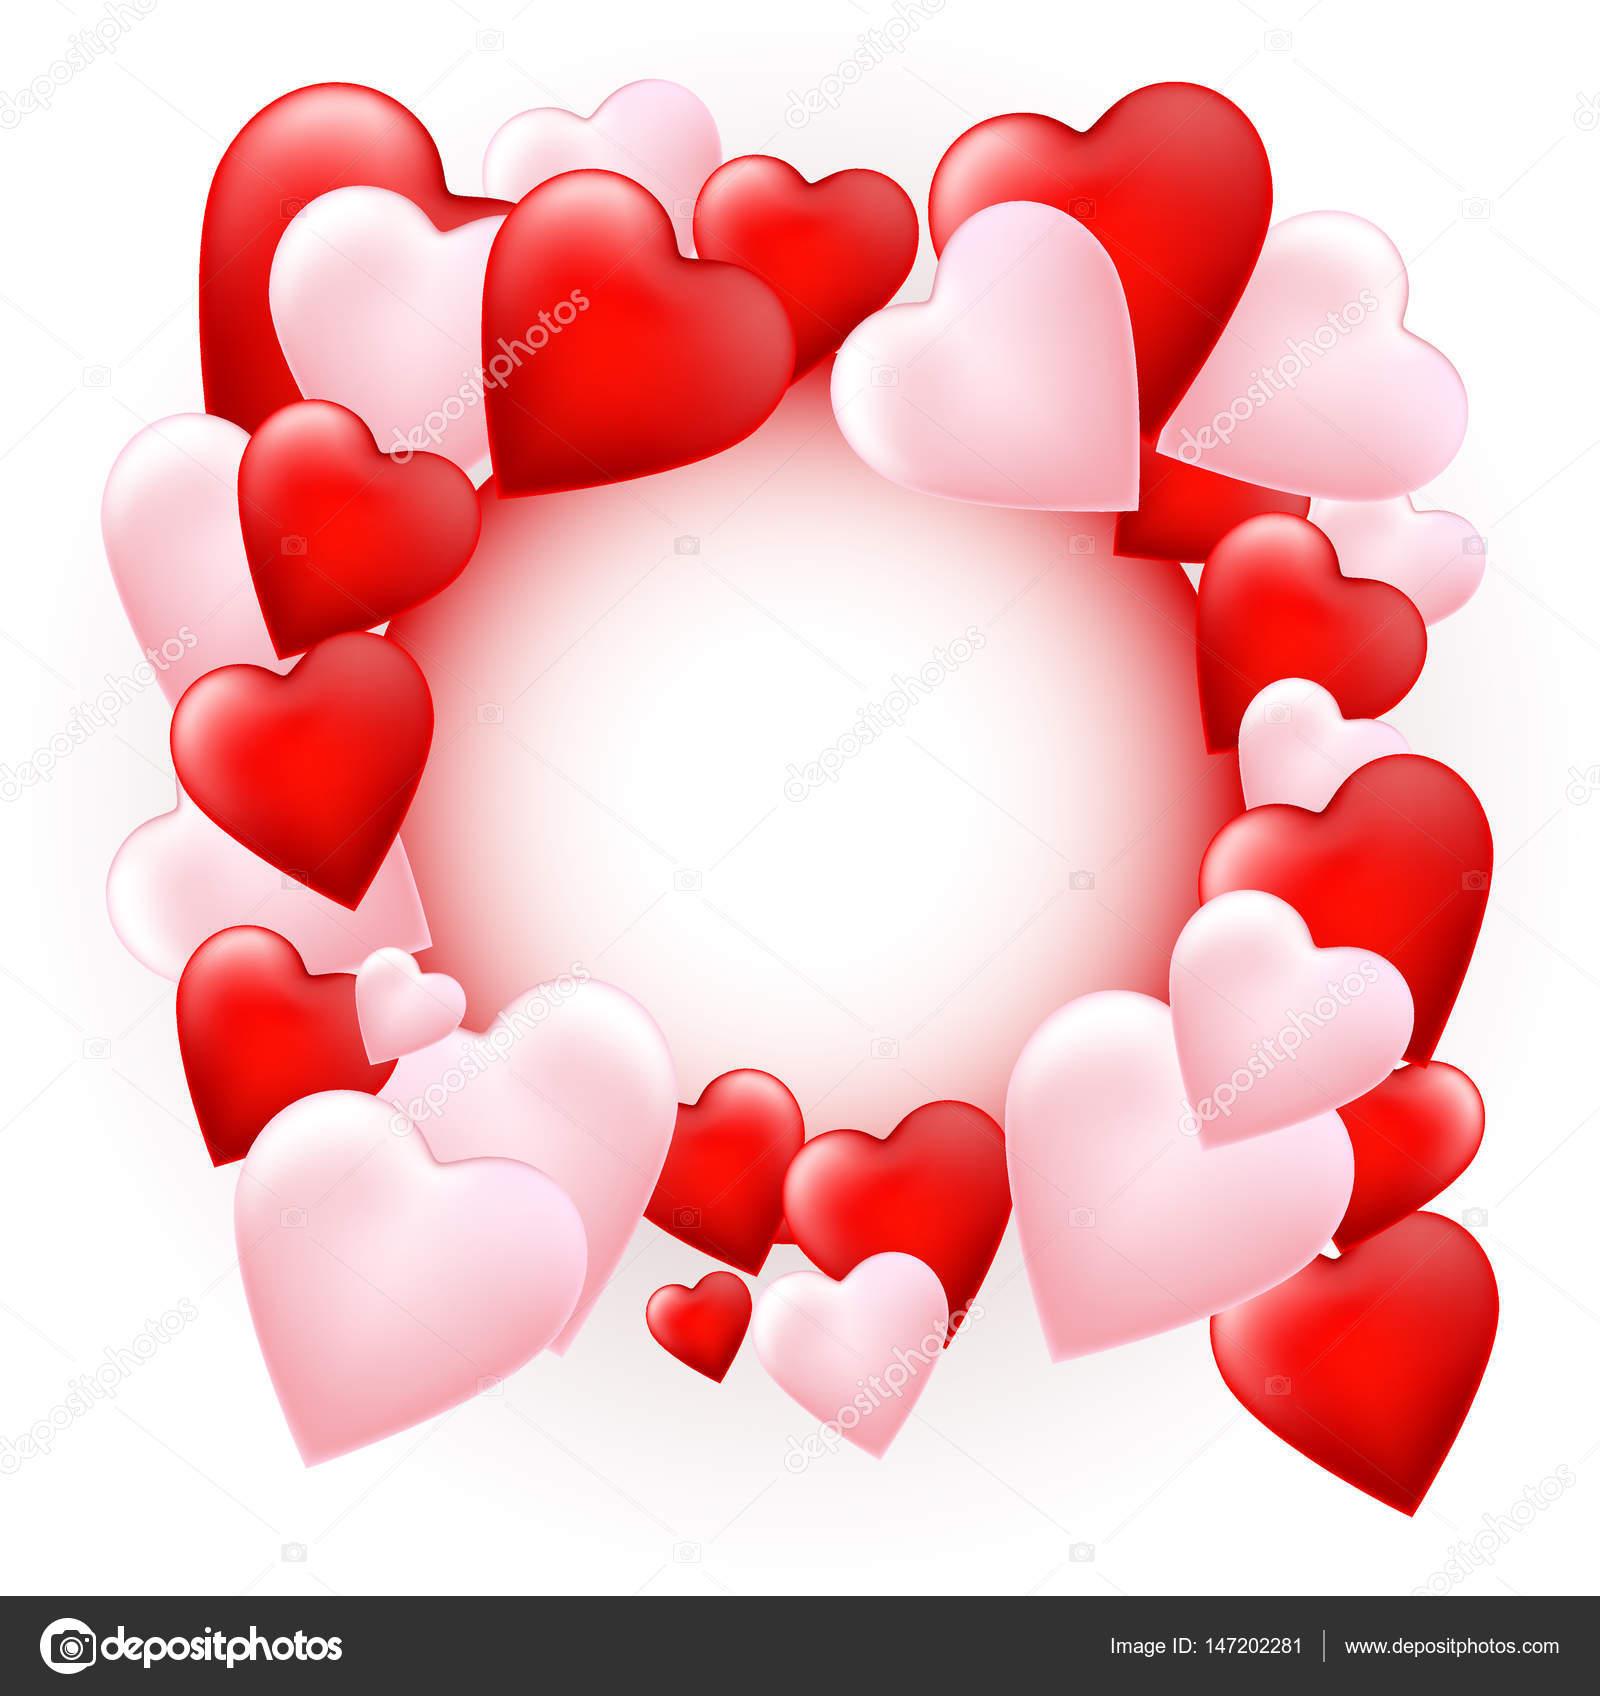 fond coeur saint-valentin — image vectorielle anggutchandra © #147202281